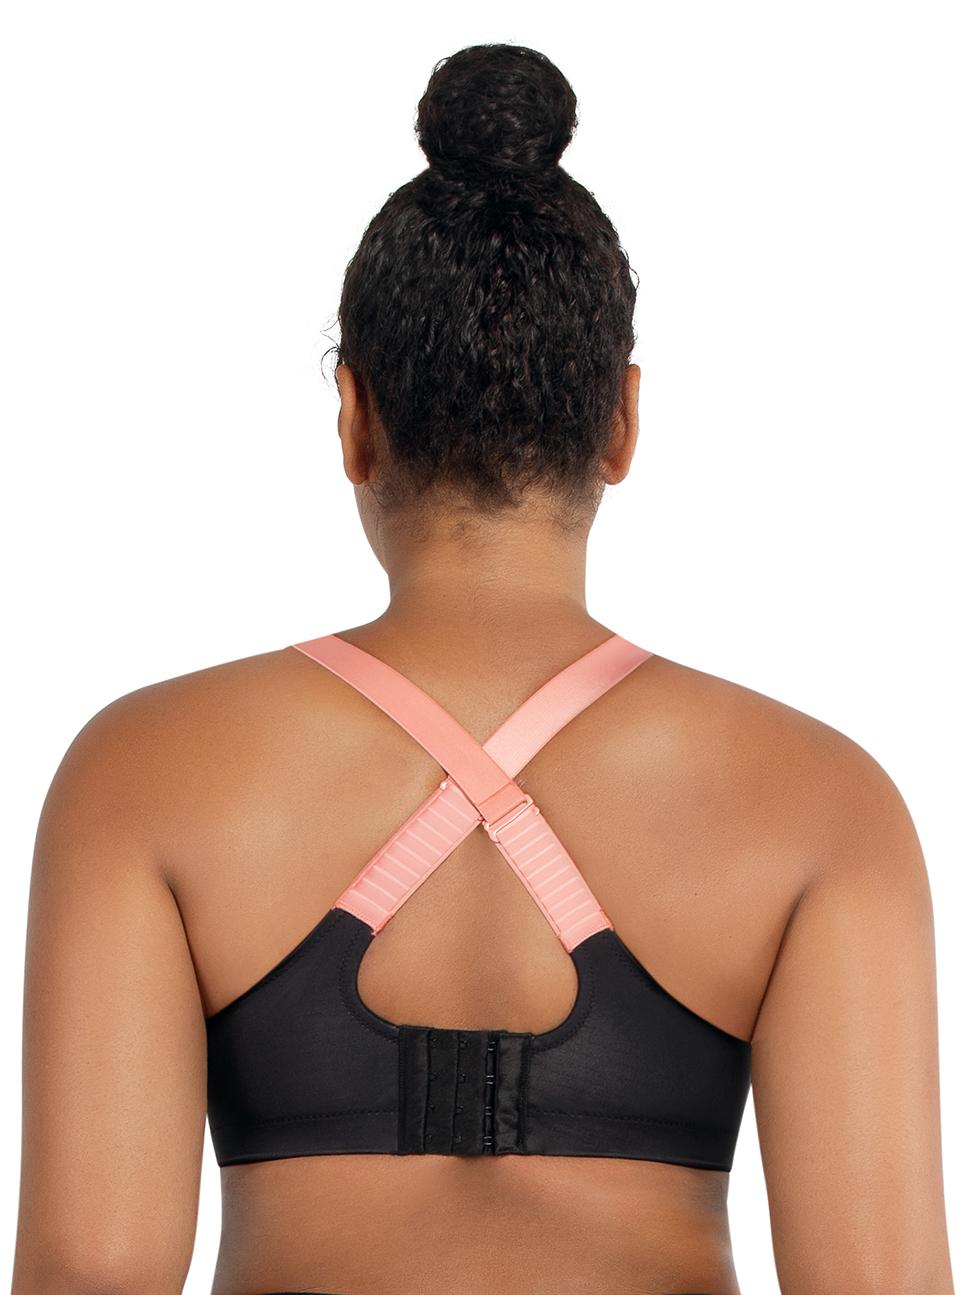 PARFAIT PowerFit UnlinedWiredSportBraP6002 BlackWPinkBlush Back - Power Fit Unlined Sports Bra Black w/ Pink Blush P6002